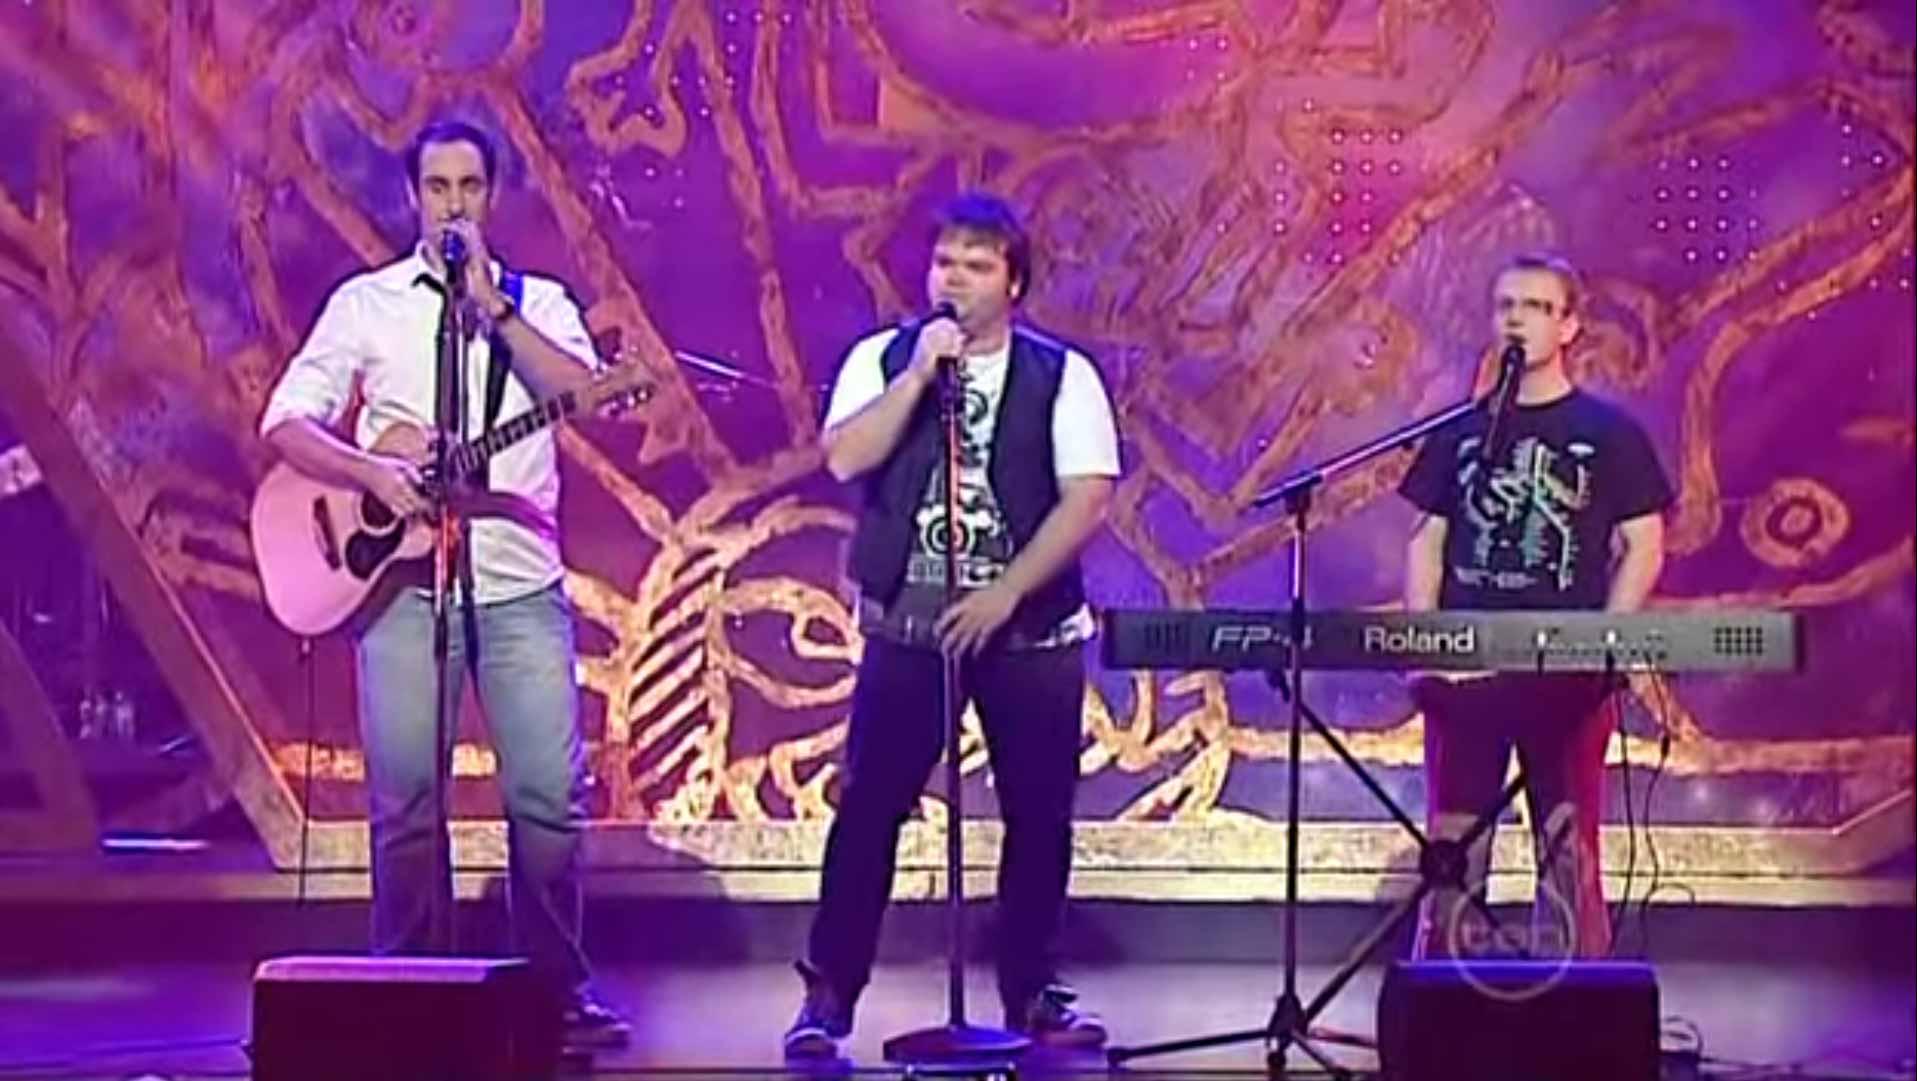 Axis Of Awesome 4 Chords Axis Of Awesome 4 Chords Melbourne International Comedy